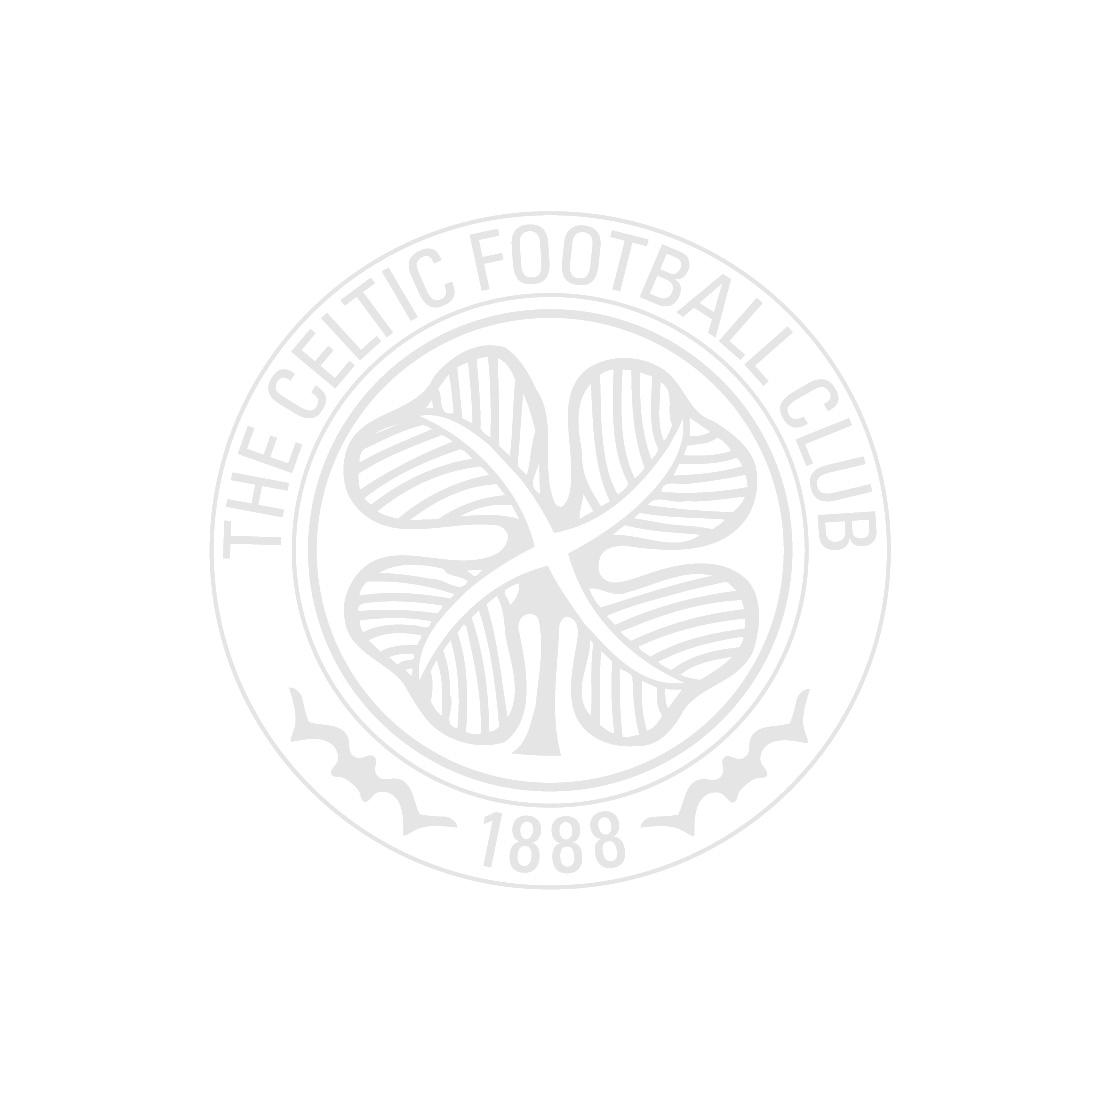 Celtic Distressed Print T-shirt - Online Exclusive